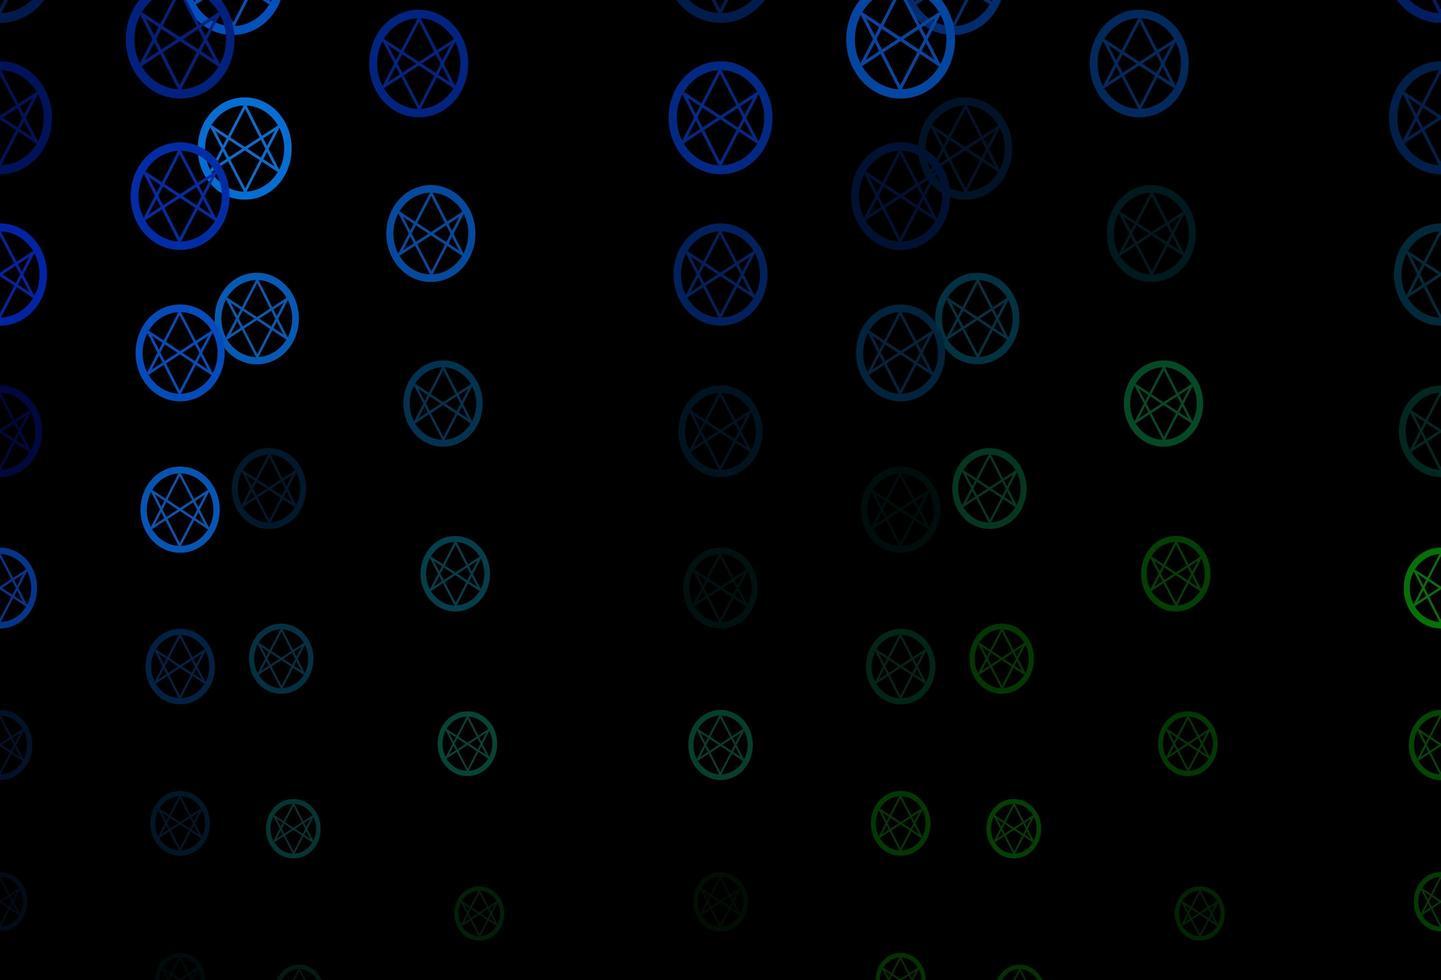 texture de vecteur bleu foncé, vert avec symboles de religion.